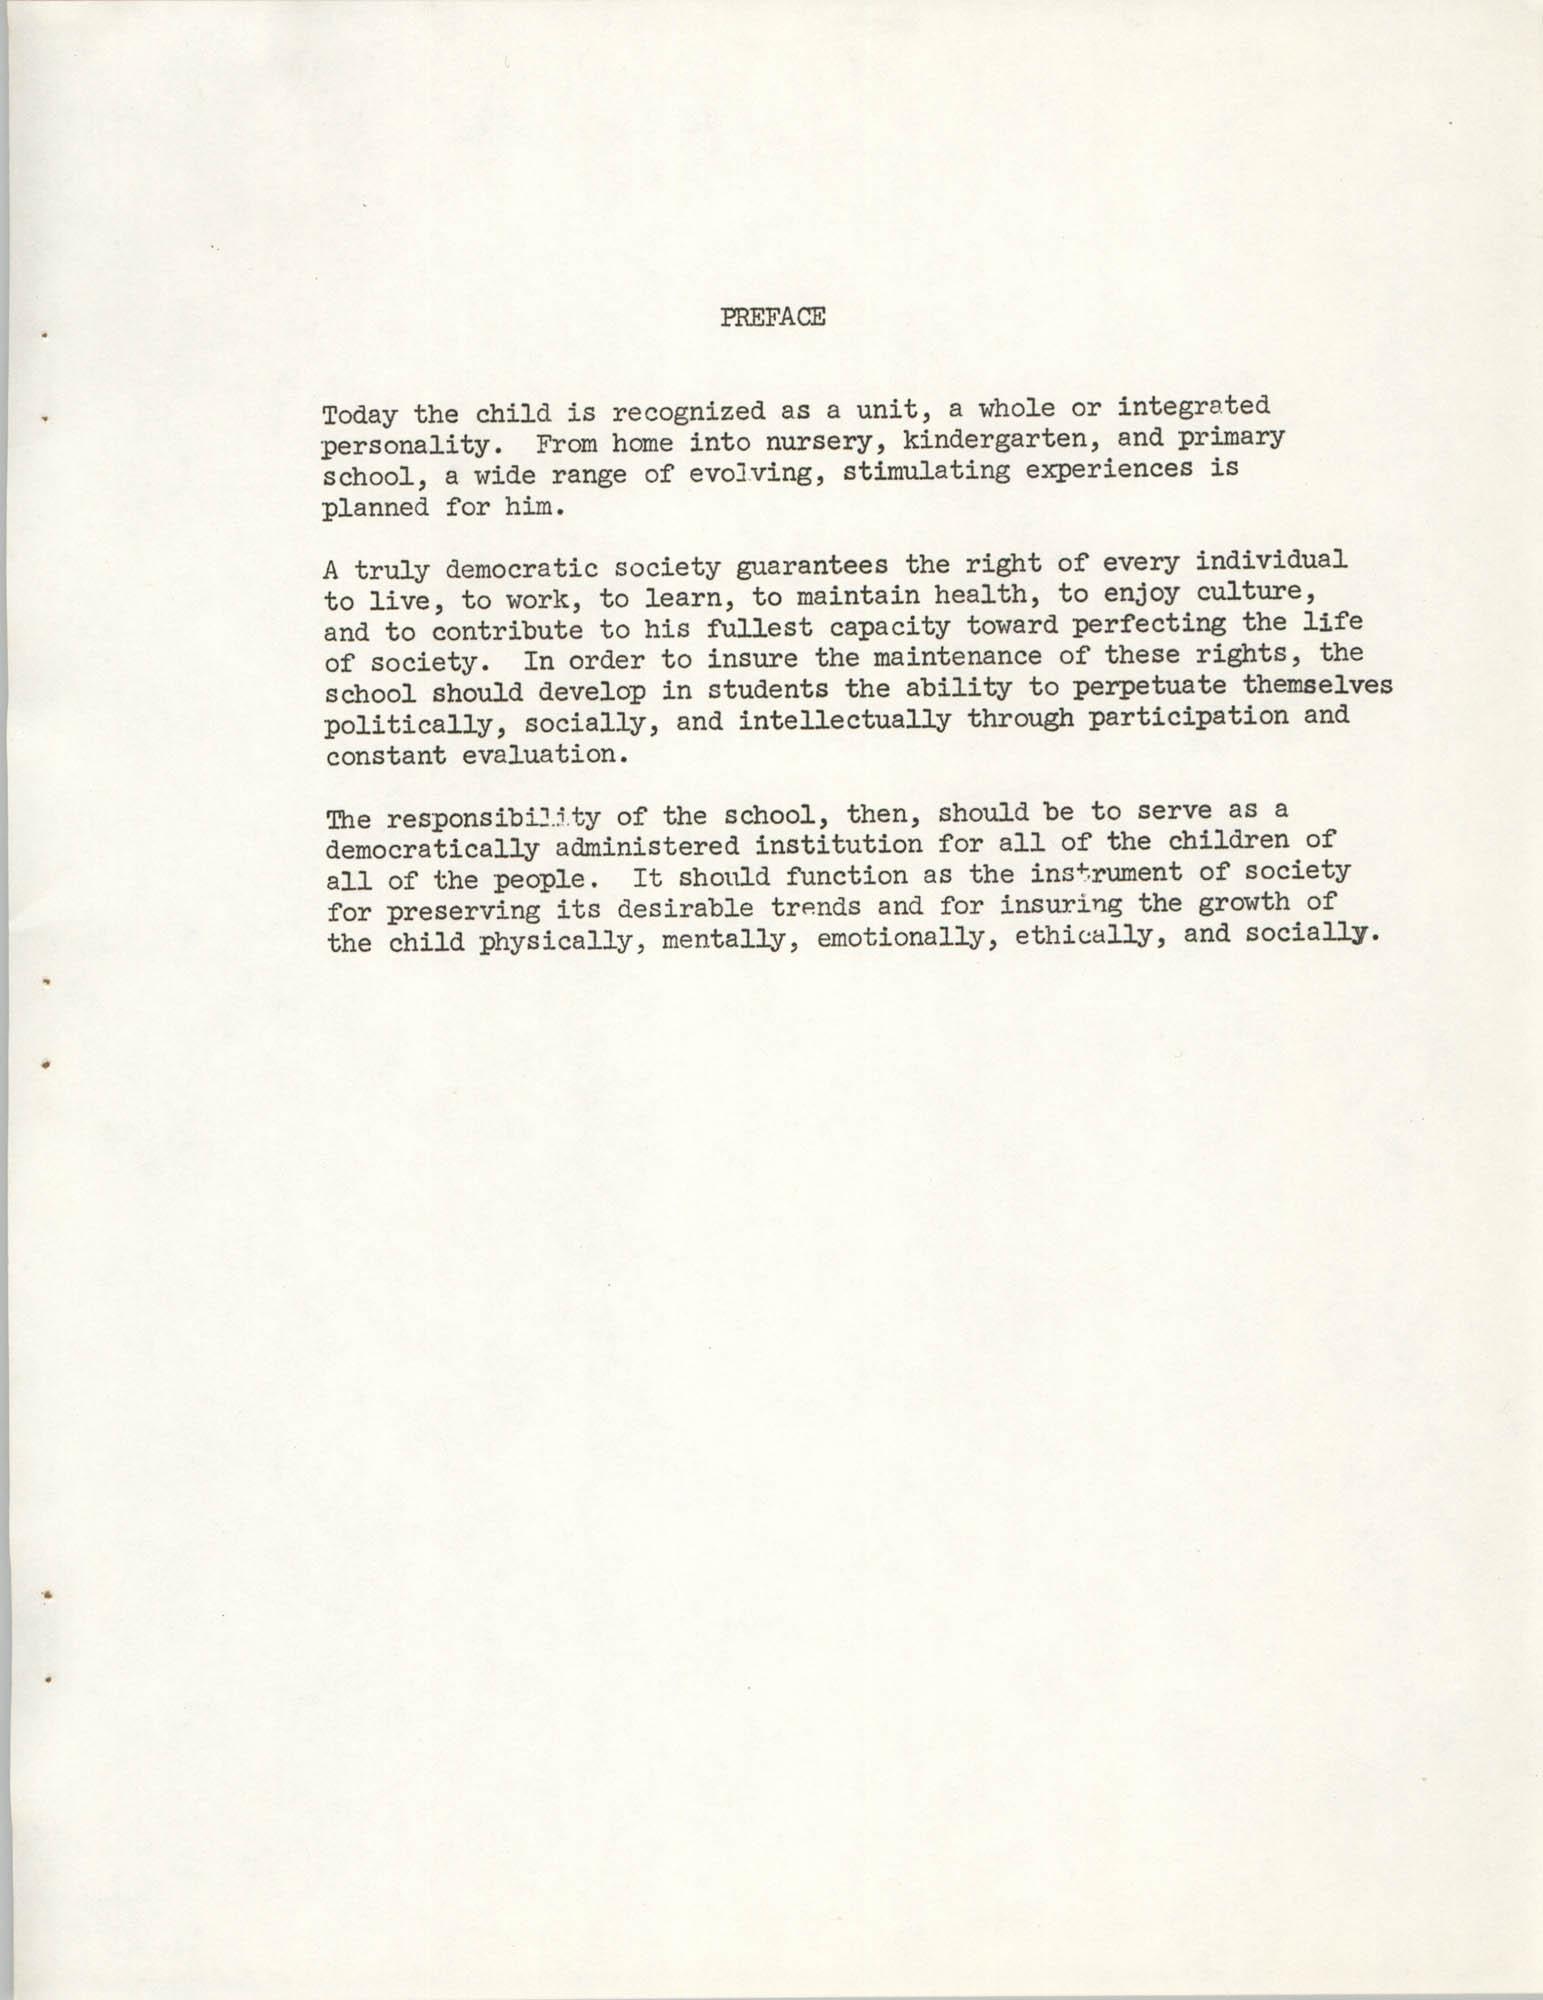 Child Care Ministry, Dorchester County, S.C., Preface